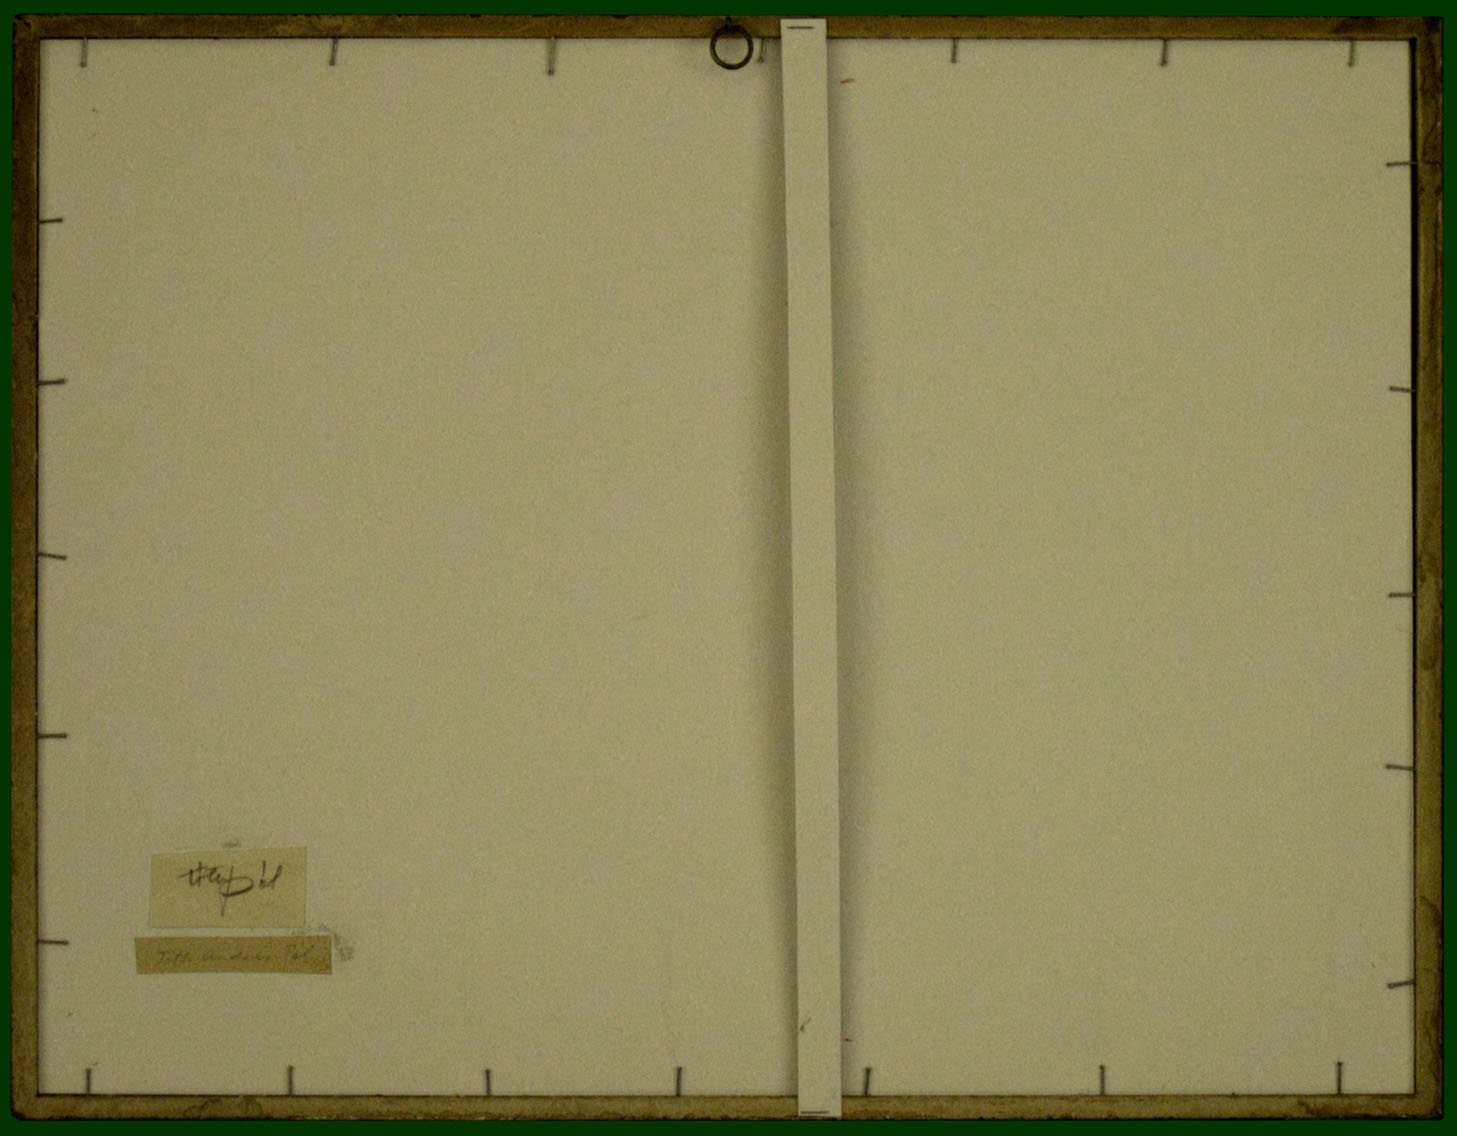 058-001hat.JPG (1457×1136)